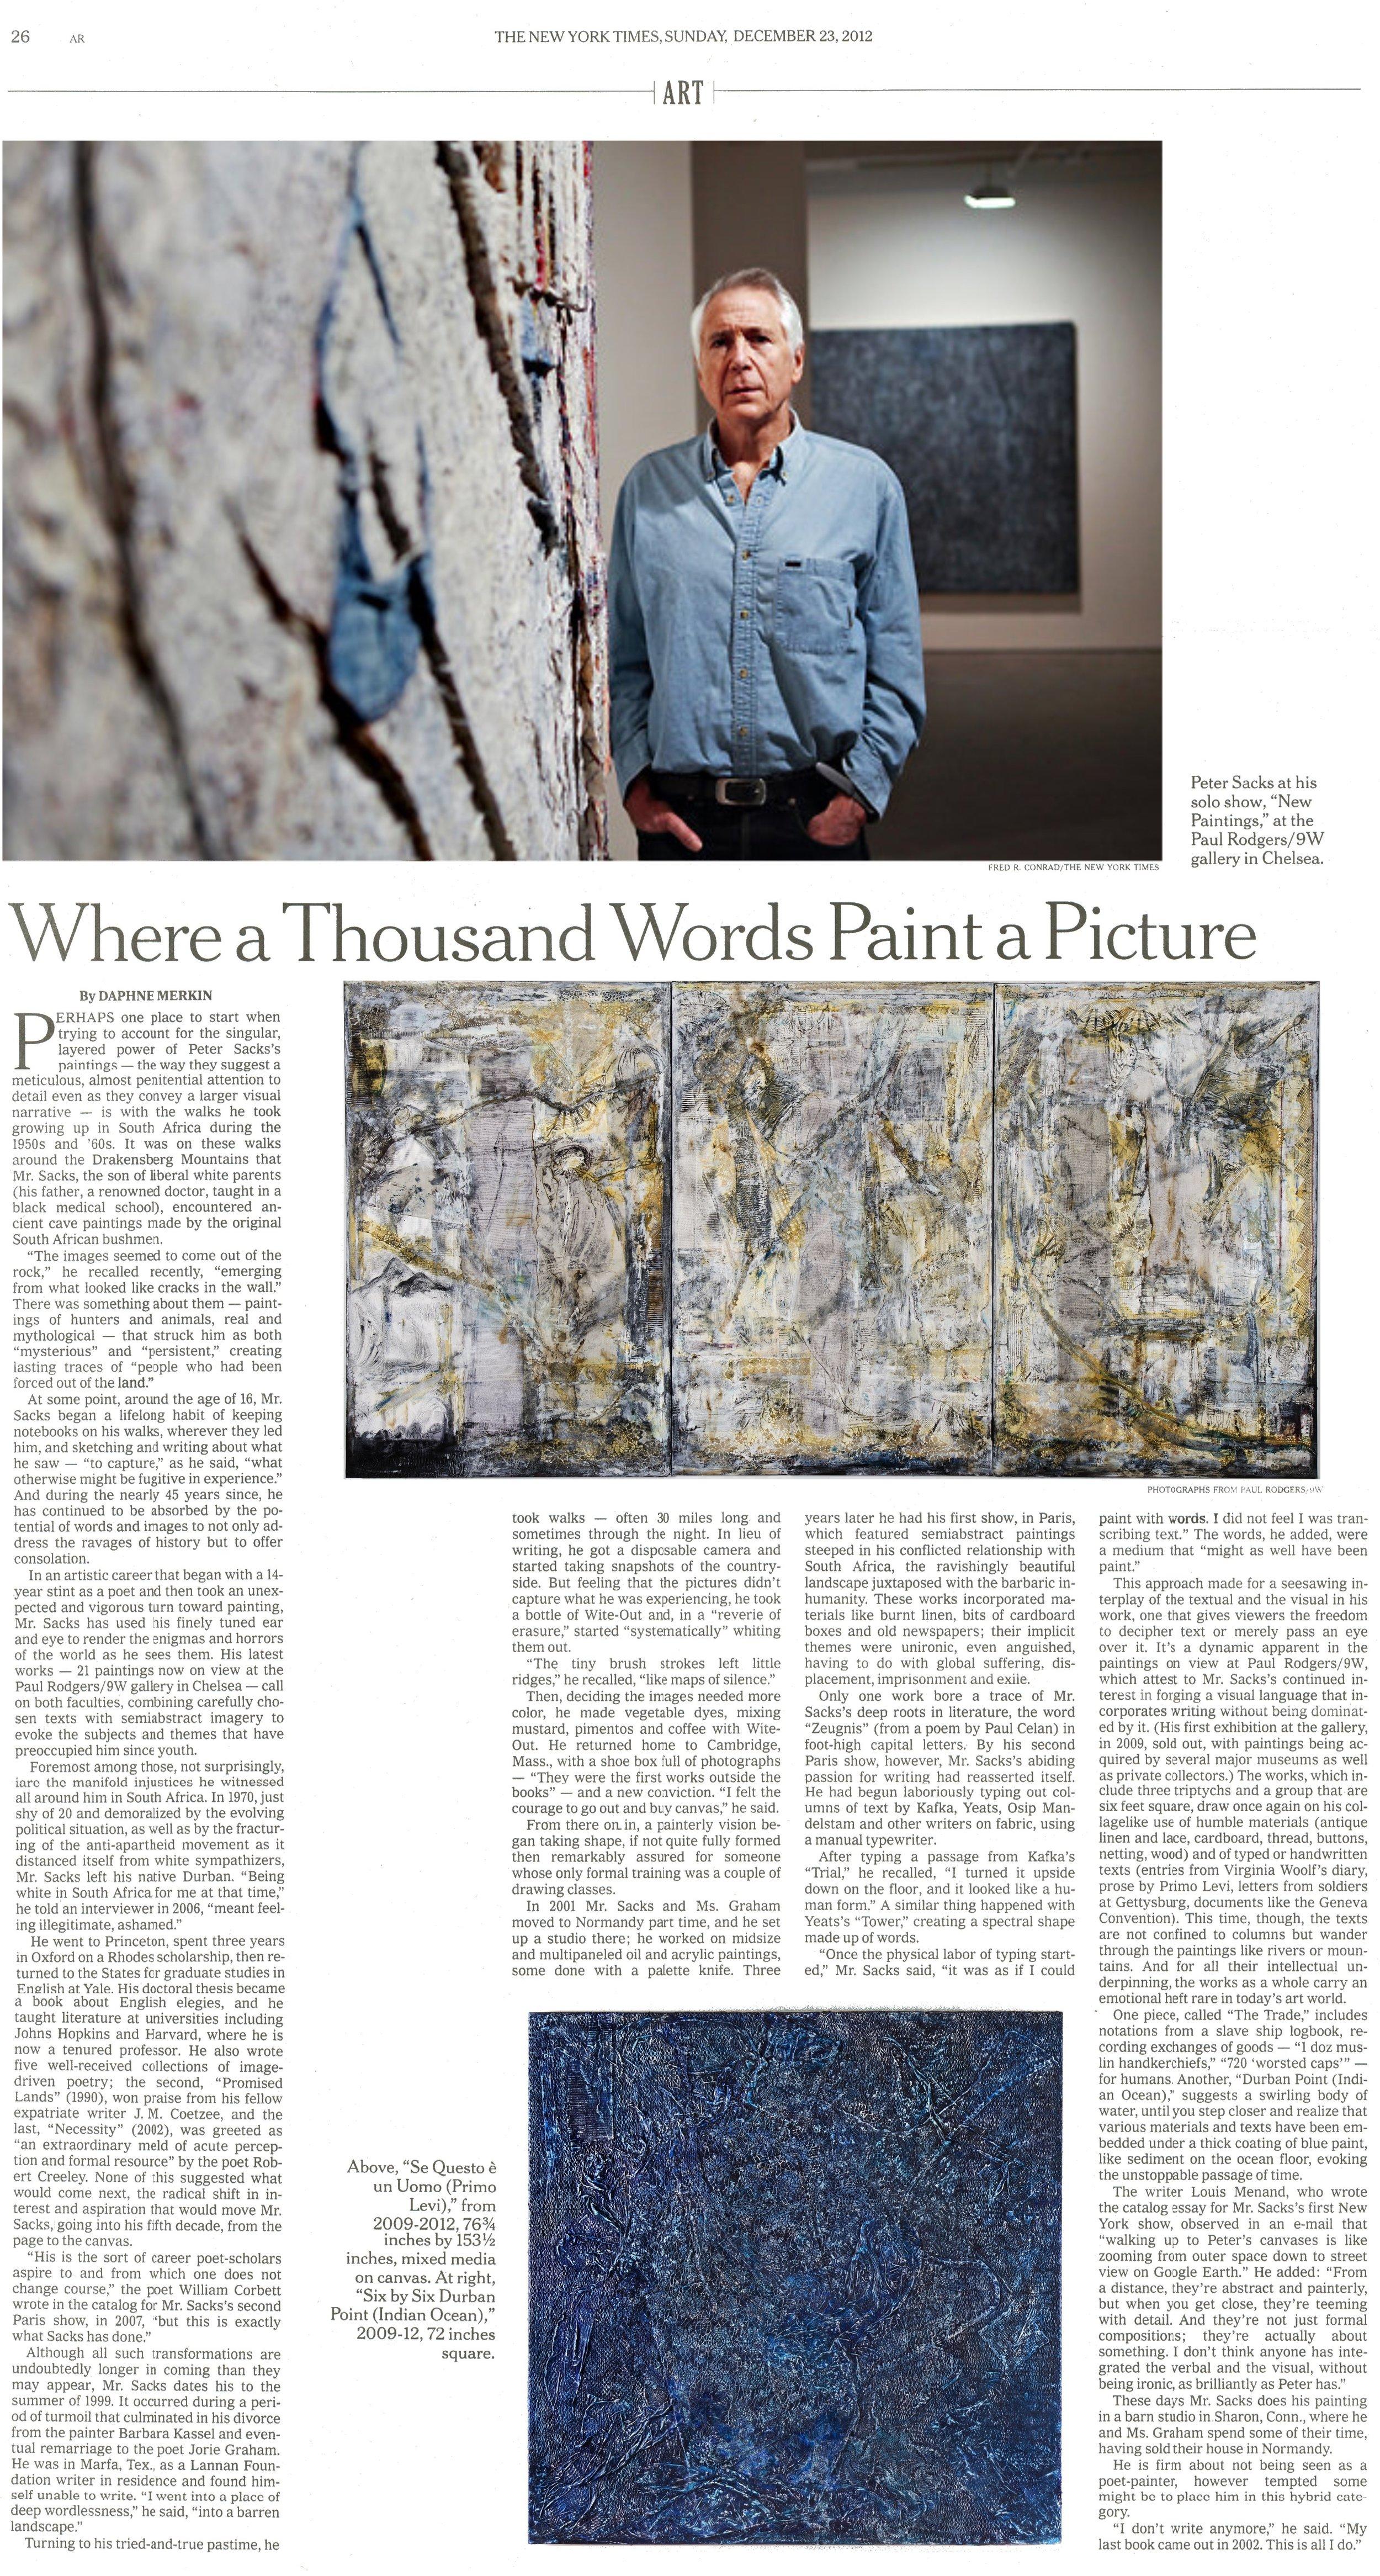 Peter Sacks New York Times Daphne Merkin